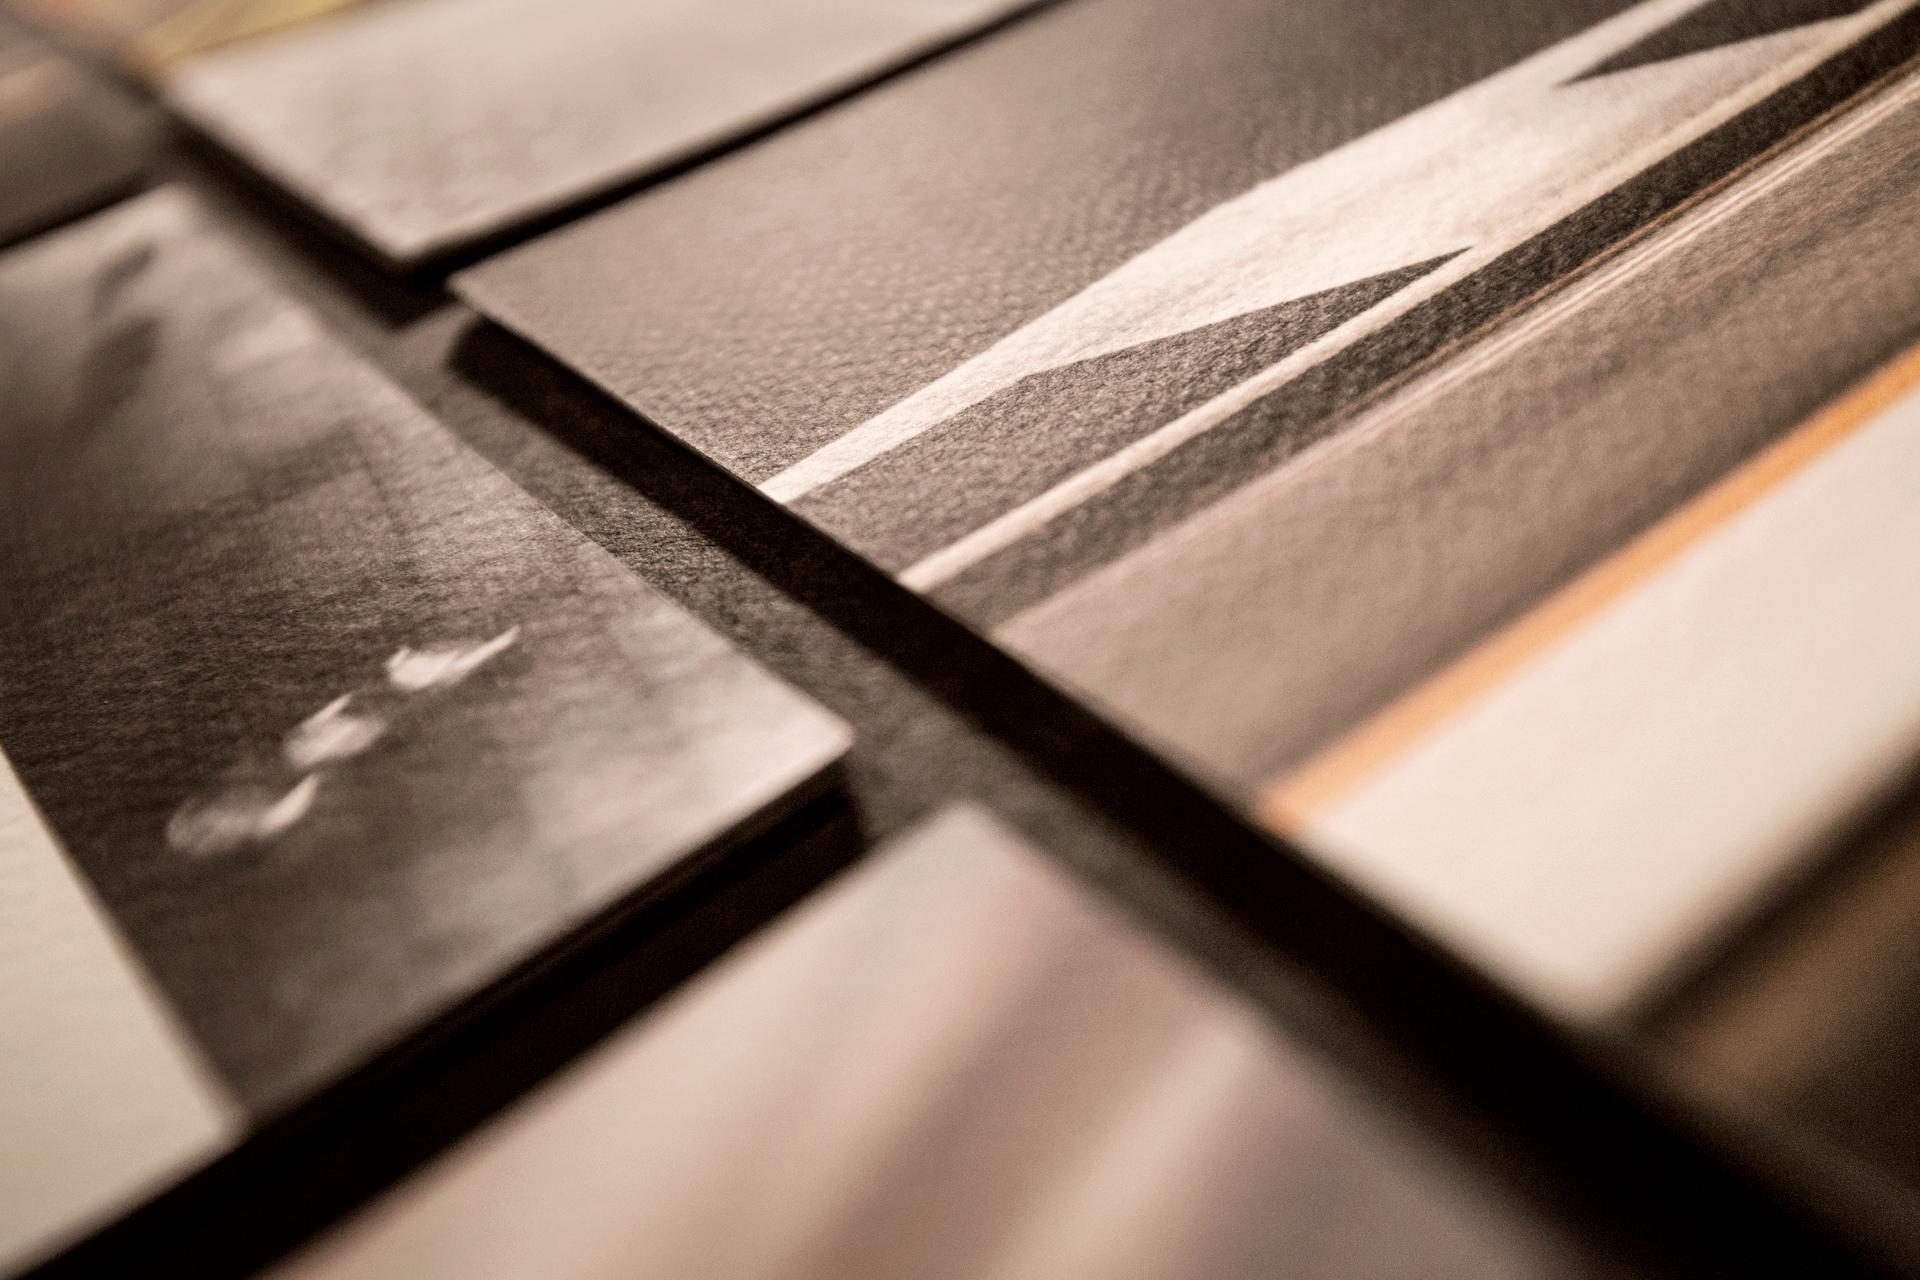 In Transit bonjourmolotov André Gigante Experimenta Design 2015 EXD15 Photography Exhibition Exposição Fotografia Cooperativa Árvore 15 N.jpg